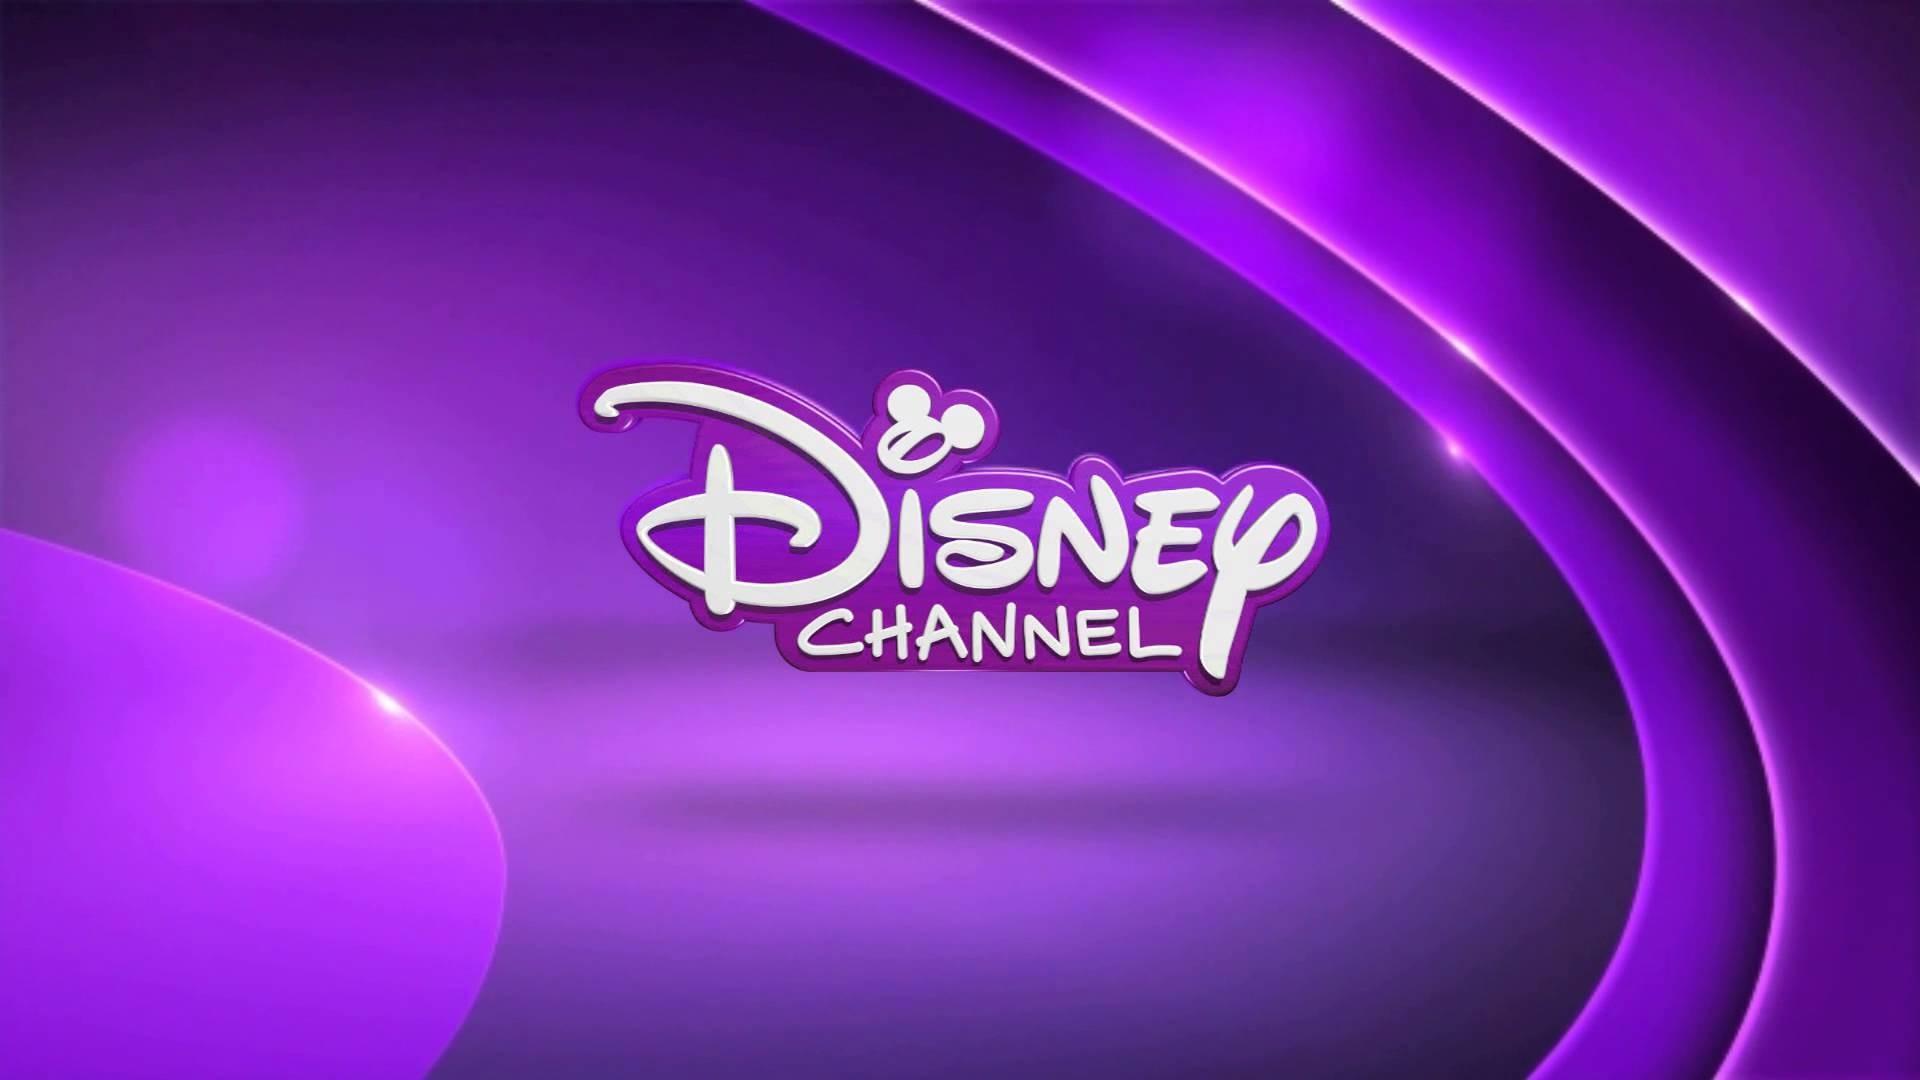 Gravity Falls Wallpaper Full Hd Disney Channel Wallpaper 63 Images